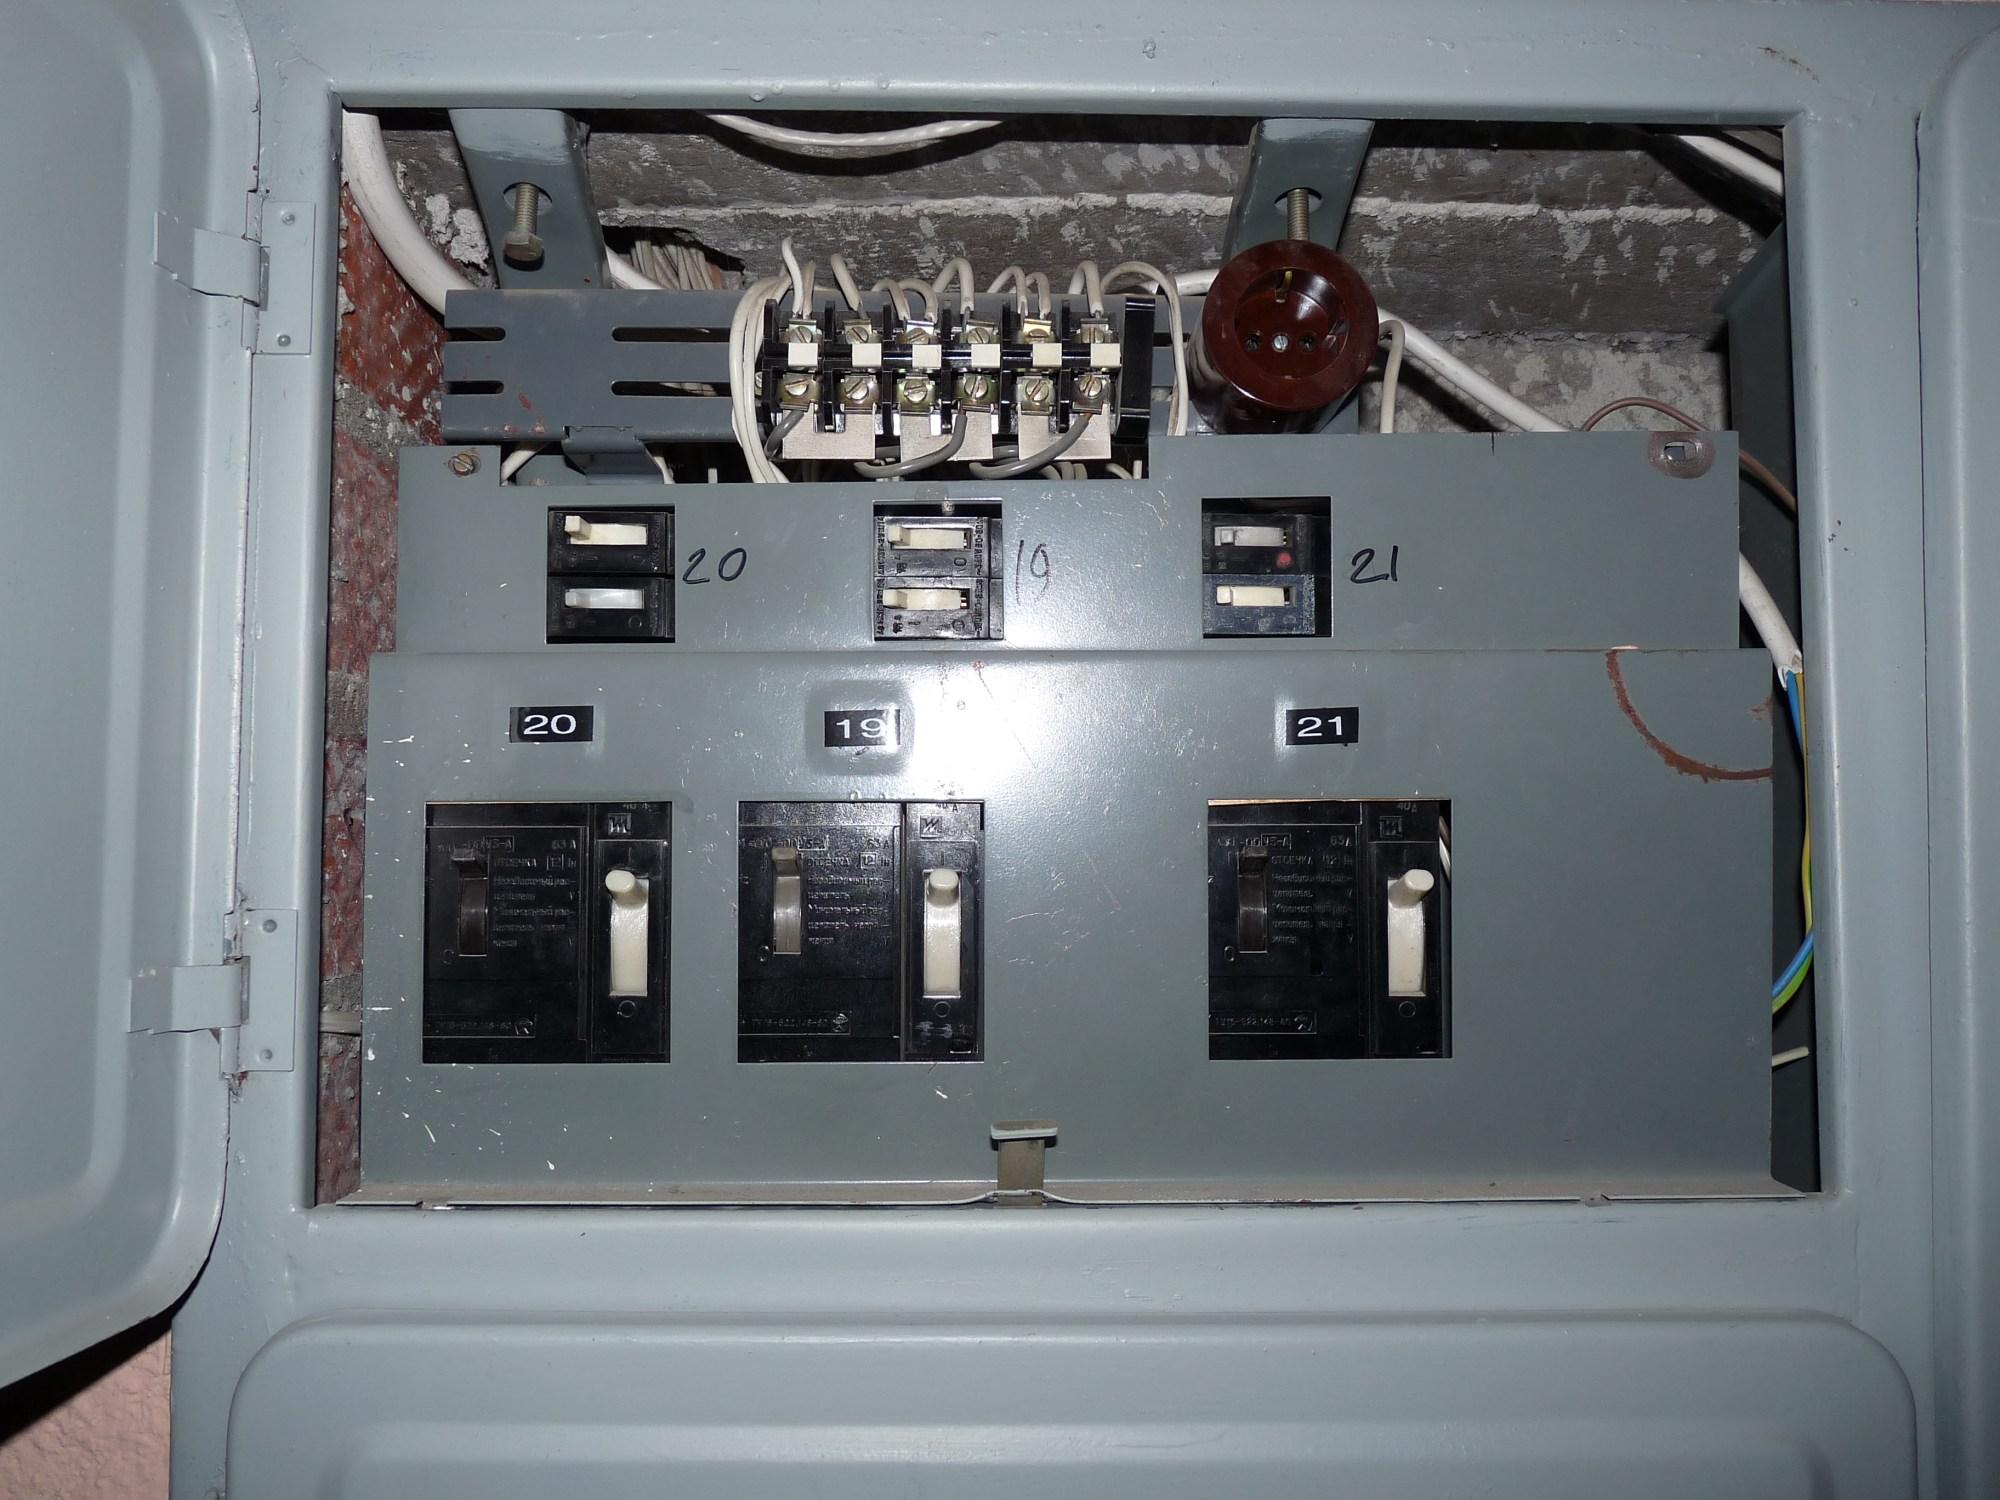 hight resolution of file liikuri 16 old circuit breakers in fuse box jpg wikimedia old electrical fuse old circuit